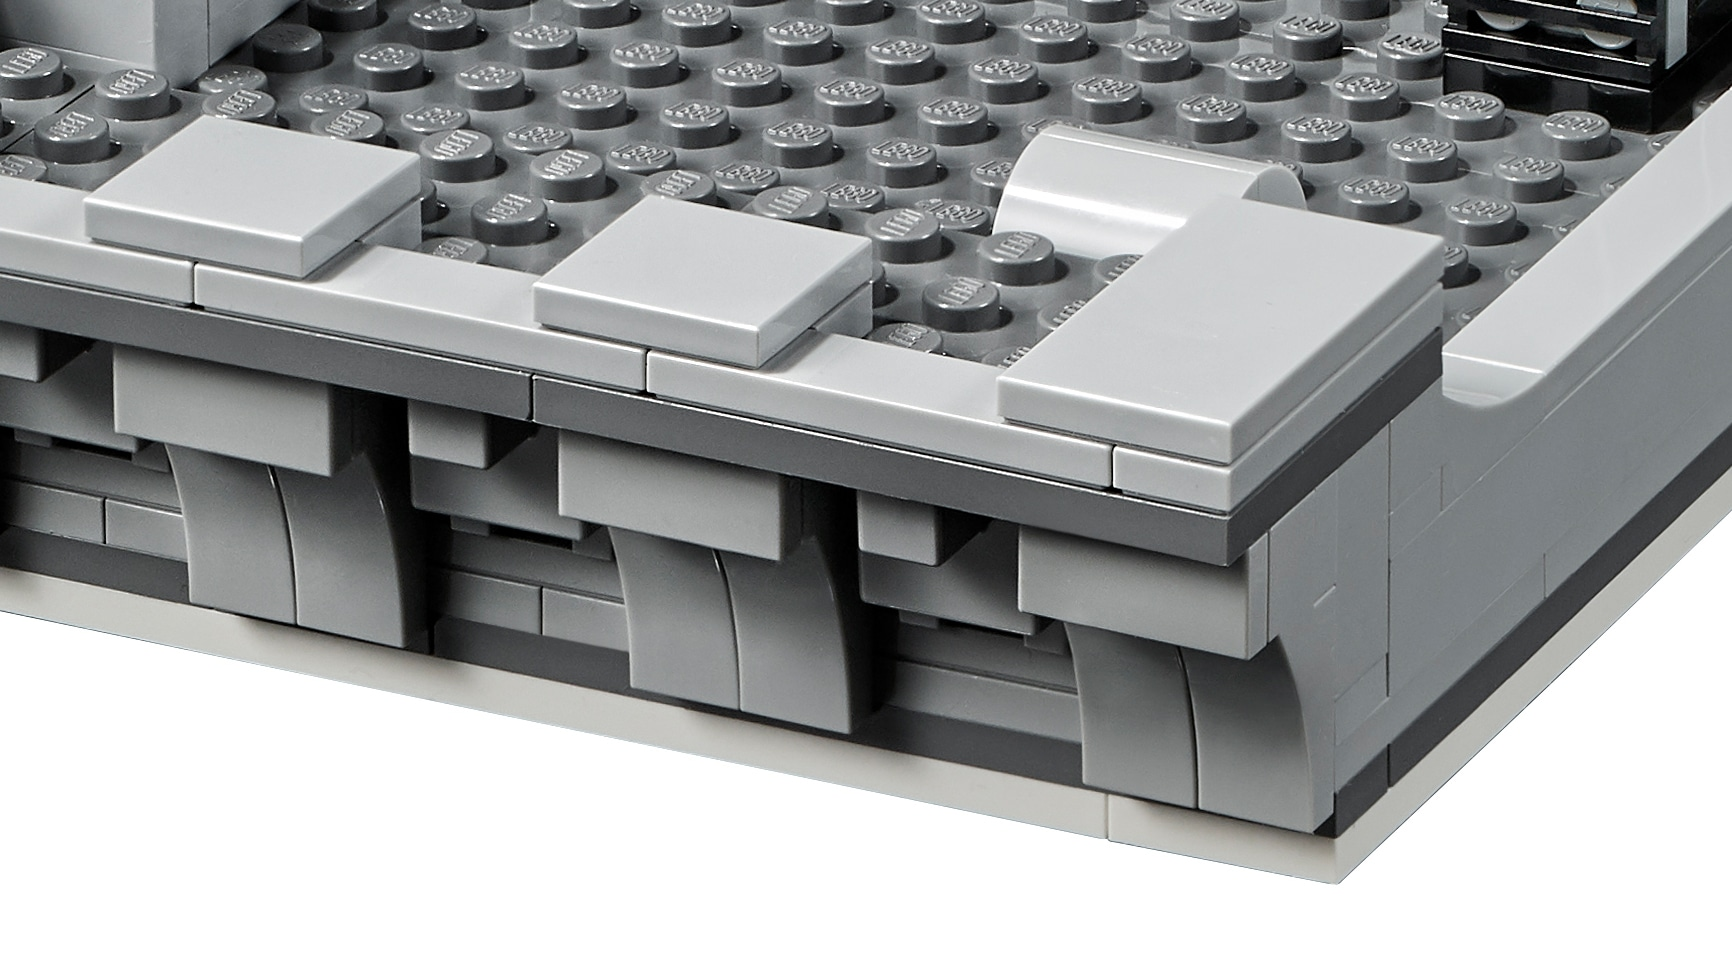 LEGO 10278 Polizeistation Modular Building Neue Teile01